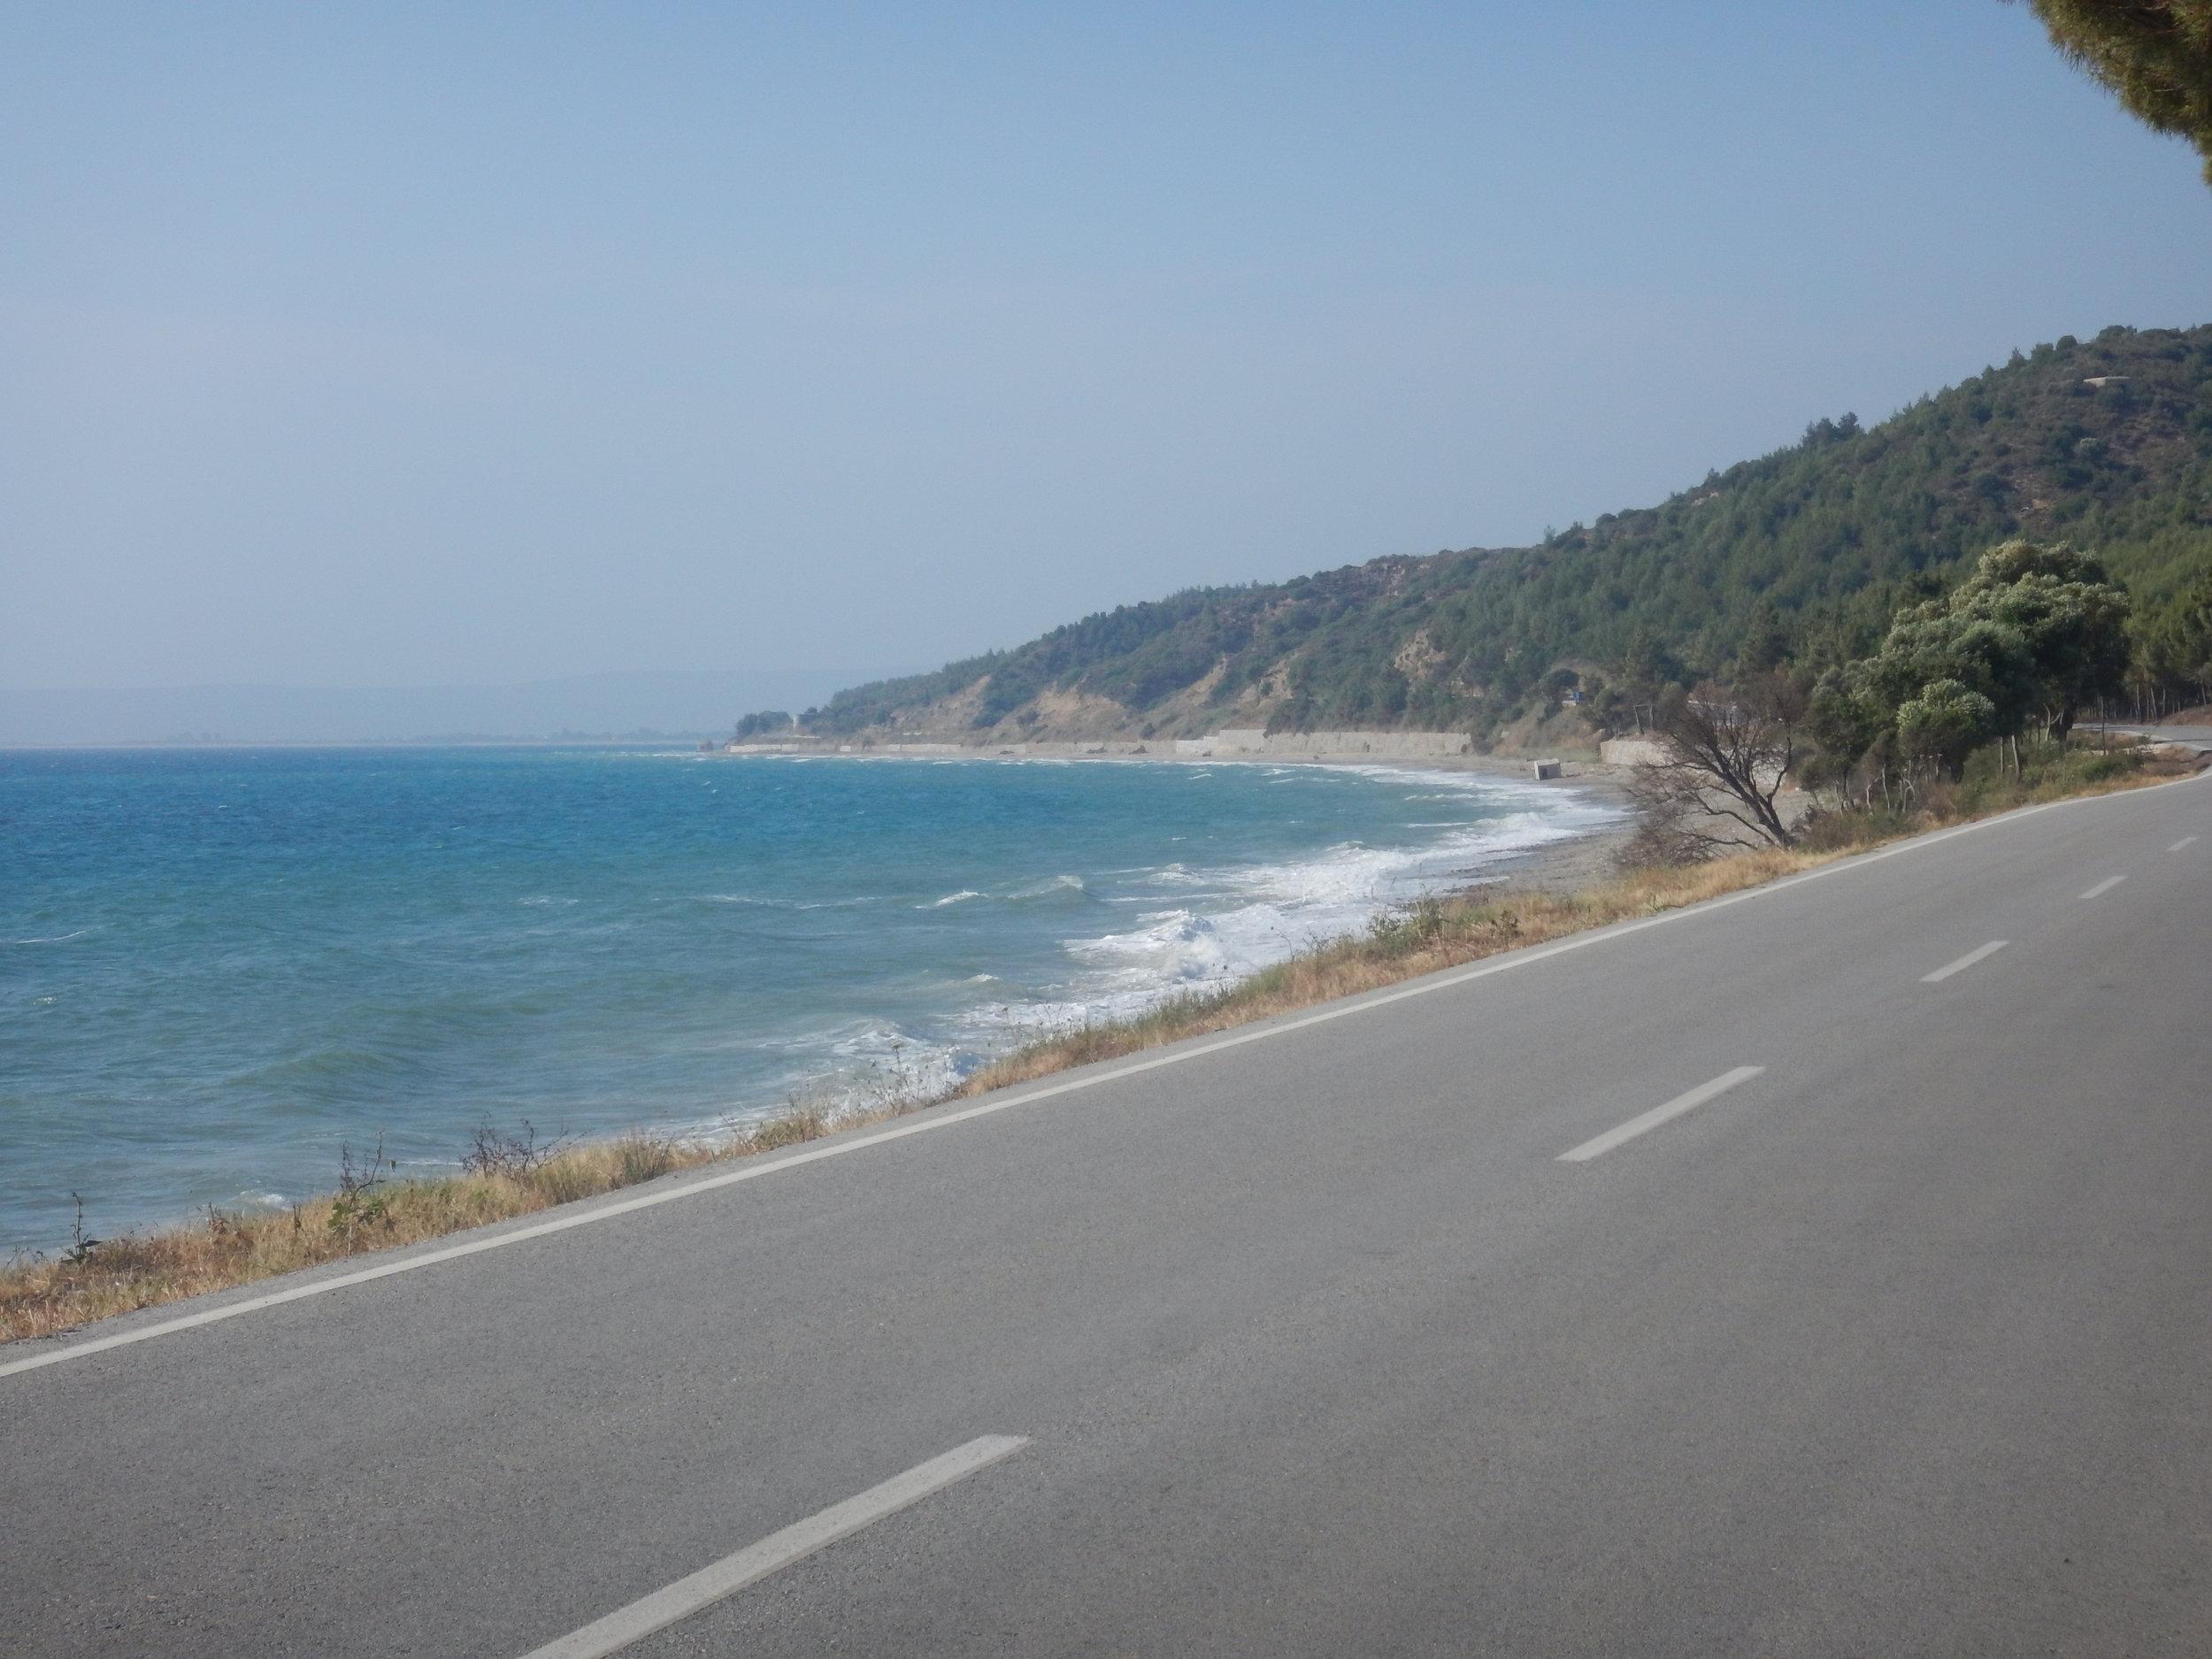 Cycling on Turkish roads - wheretheresawheel